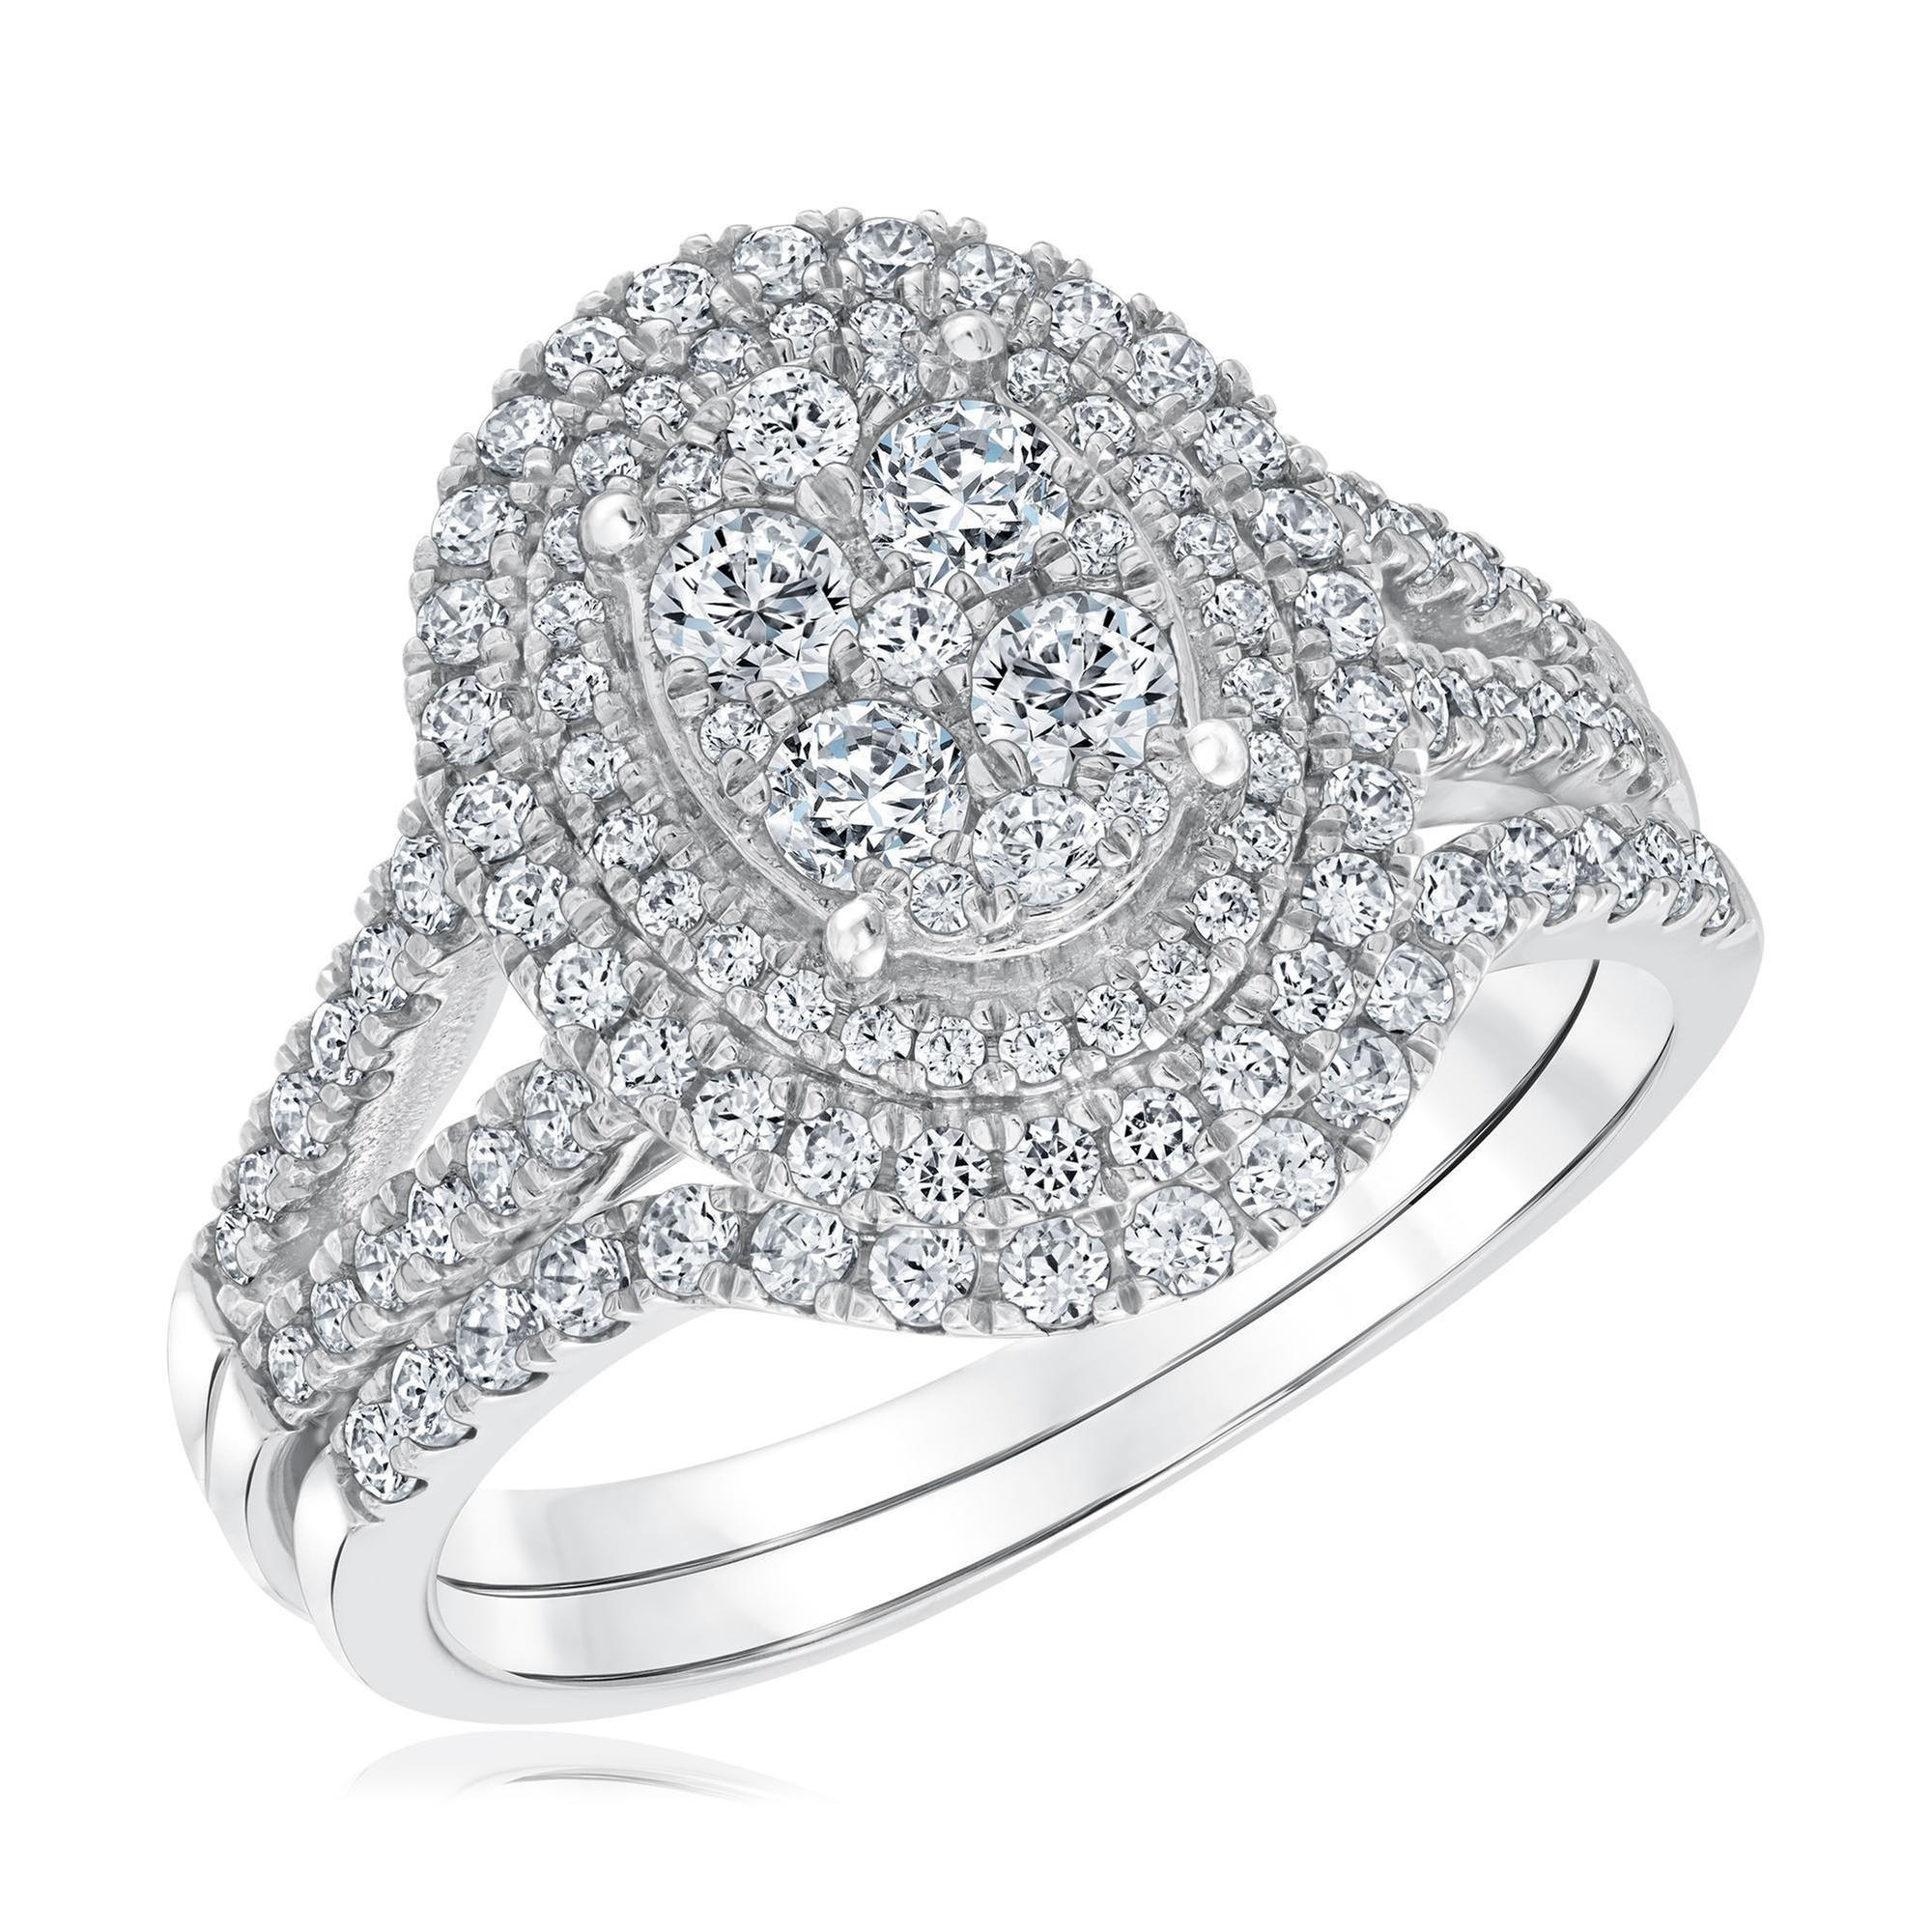 Round Cut Diamond Multi-Top Double Halo Engagement Ring Set 1 1/4ctw - Size 7